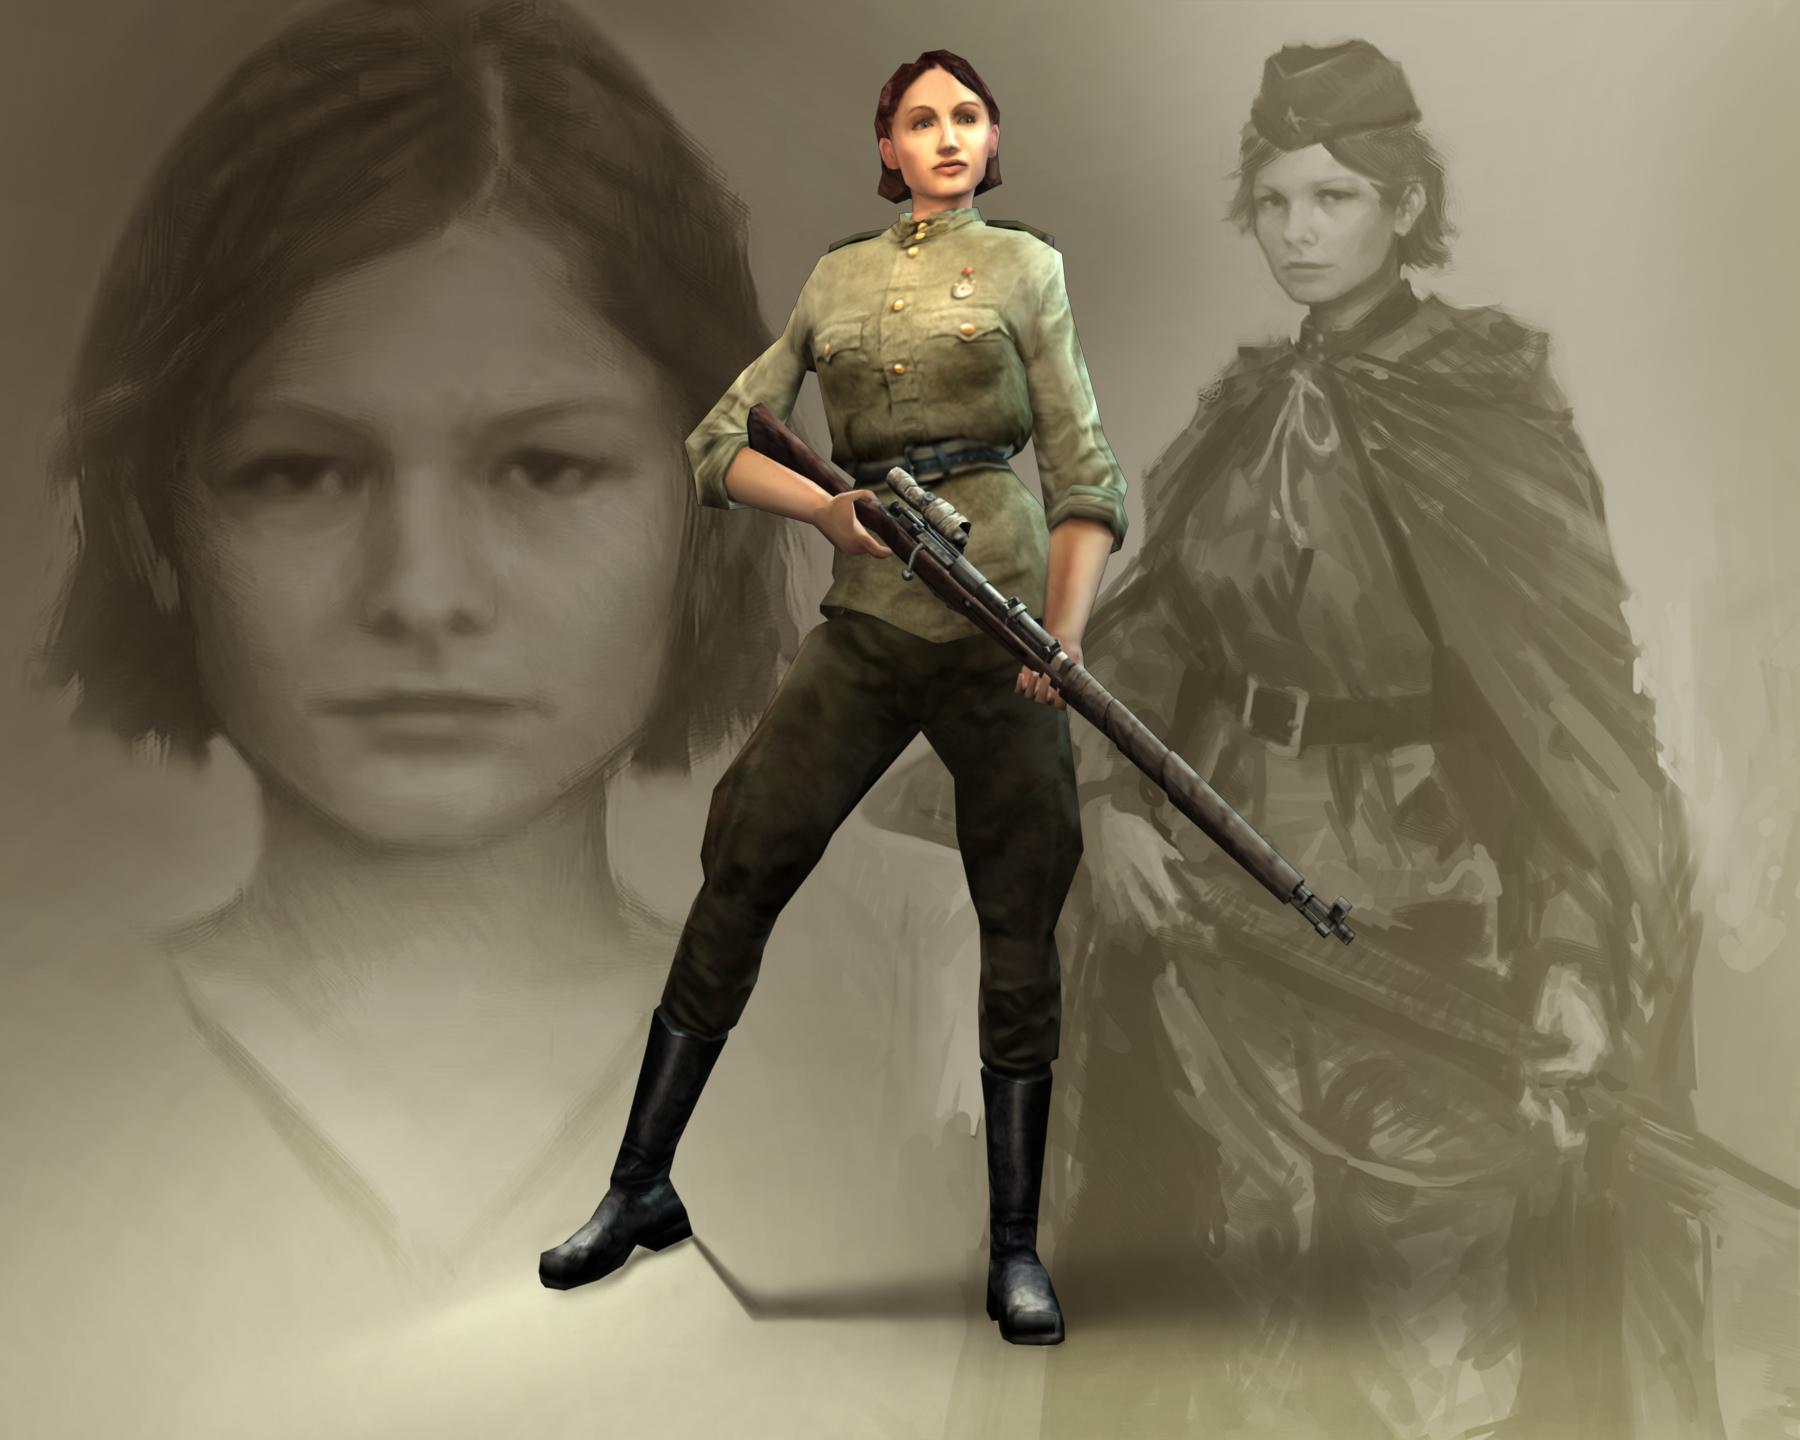 Tanya Pavelovna Call Of Duty Wiki Fandom